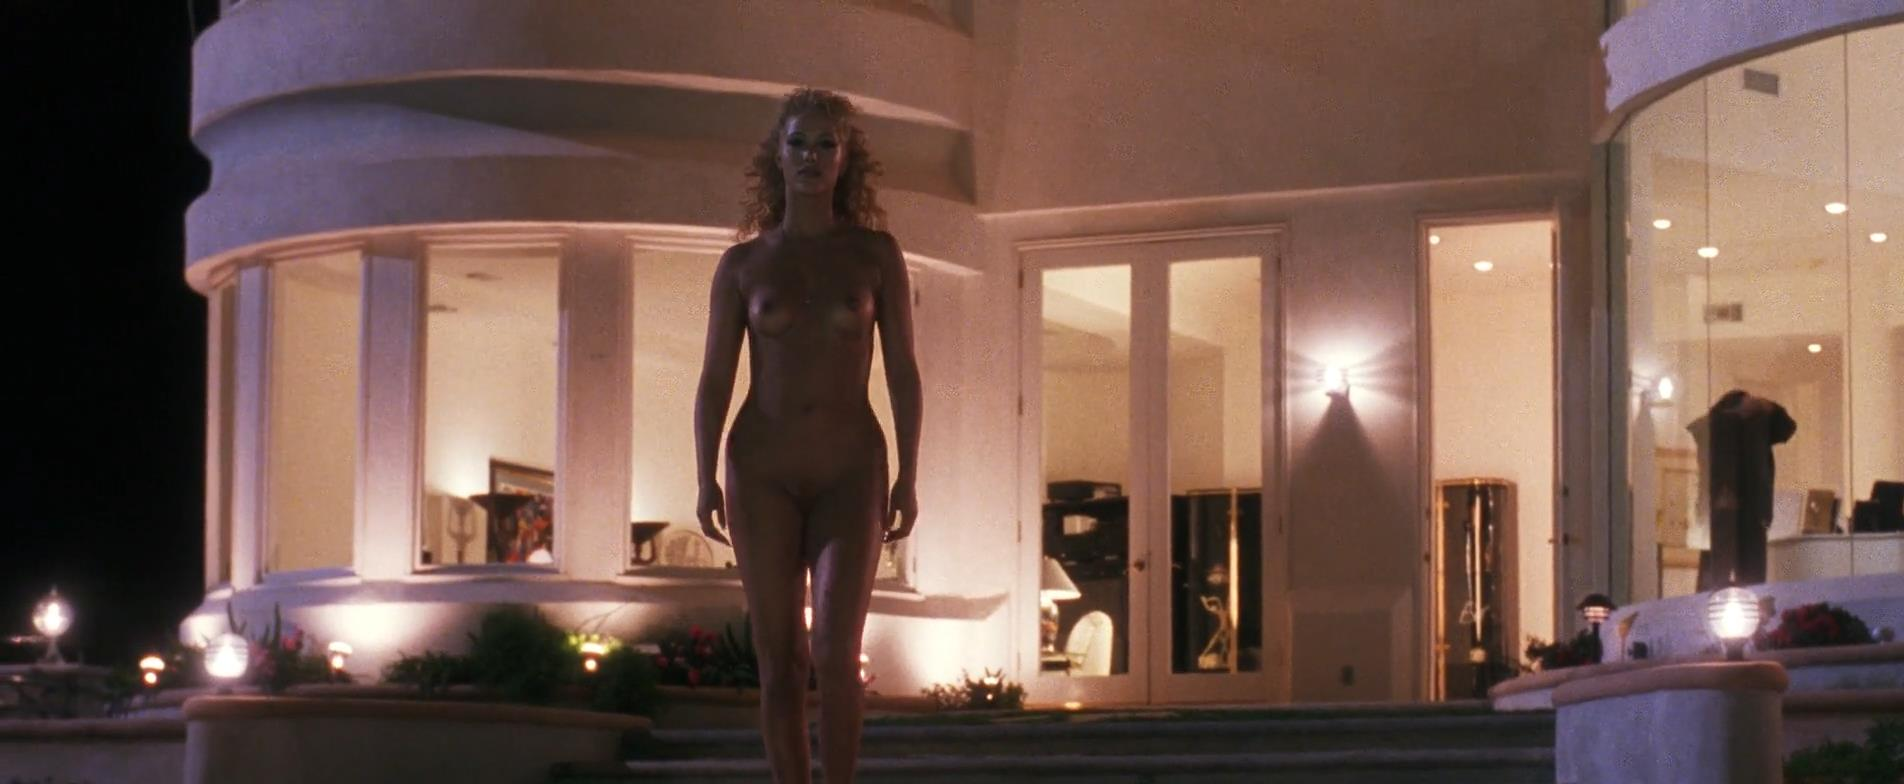 Elizabeth-Berkley-nude-full-frontal-sex-Showgirls-1995-hd1080p10.jpg